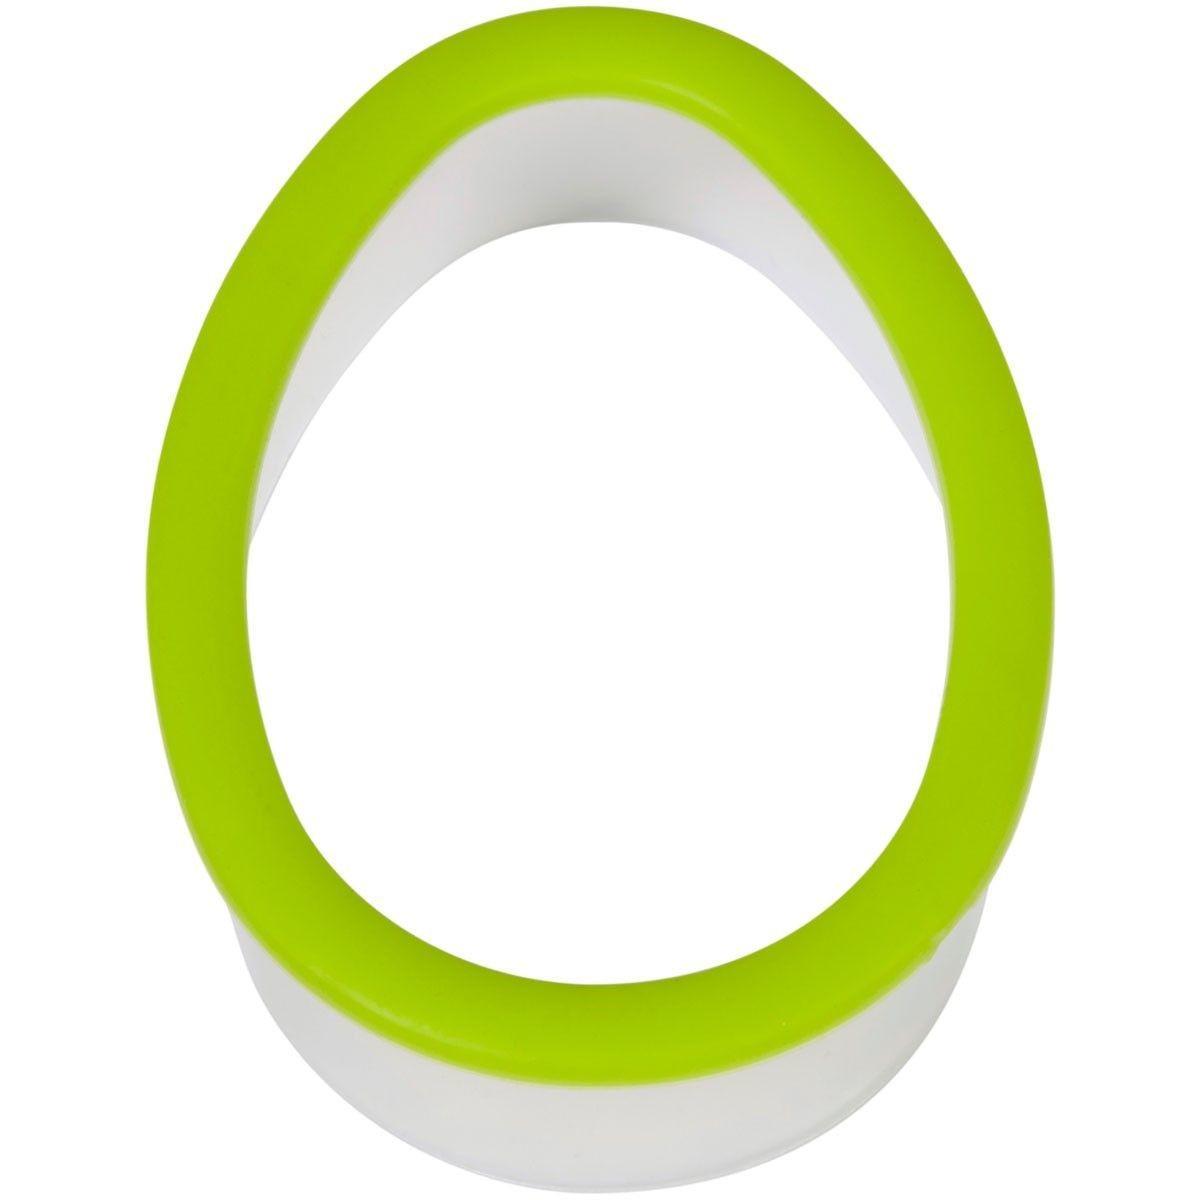 Wilton Easter Plastic Grippy Cutter -EGG - Πλαστικό Κουπ πατ Αυγό με λαβή σιλικόνης -9.5εκ